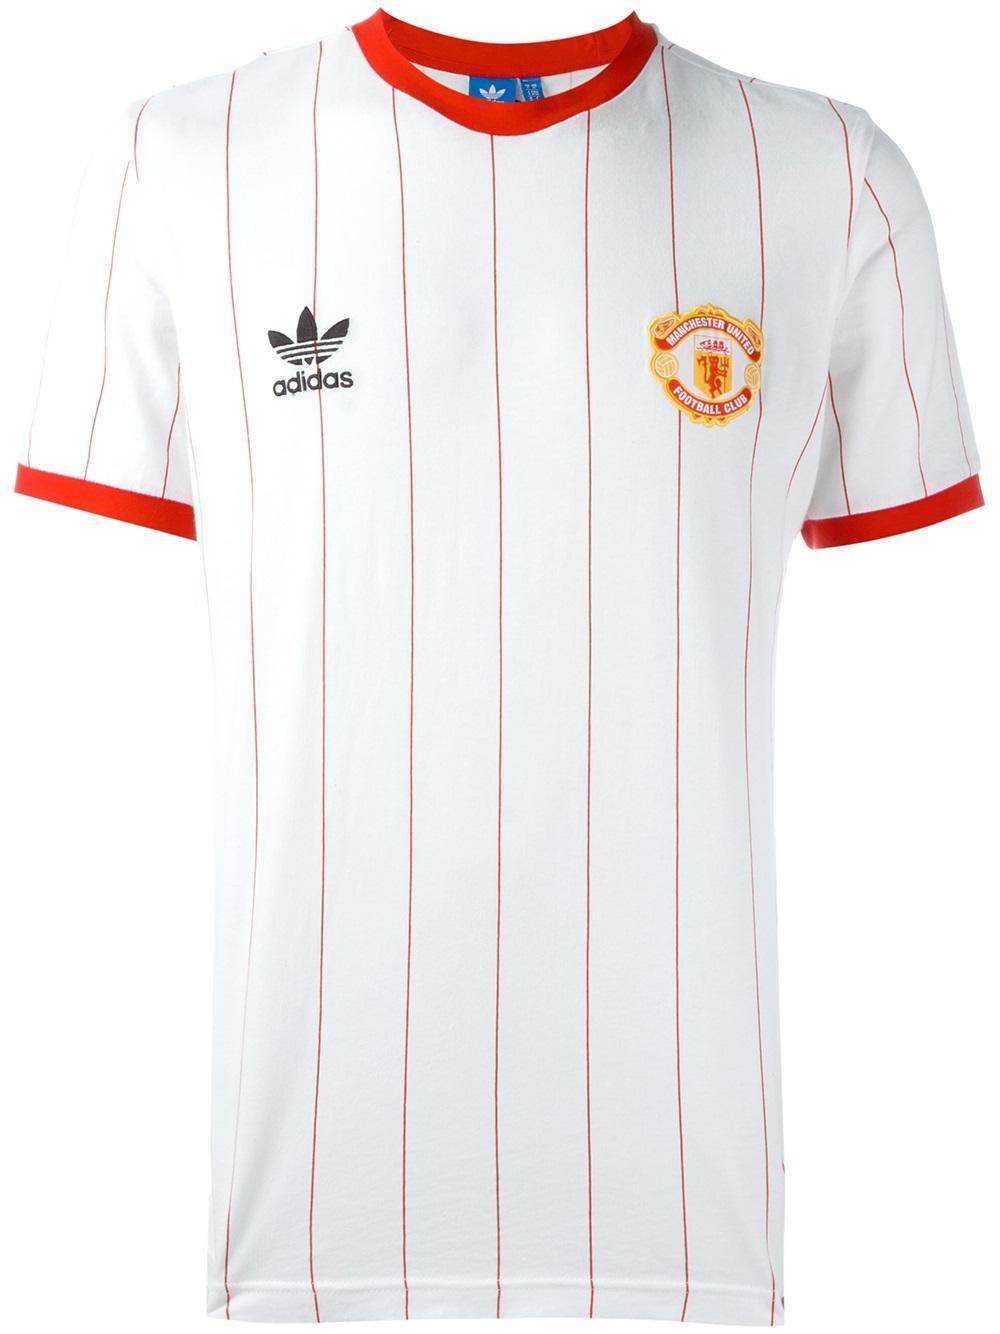 202a52069 adidas Originals Manchester United Fc Pinstripe Jersey T-shirt in ...